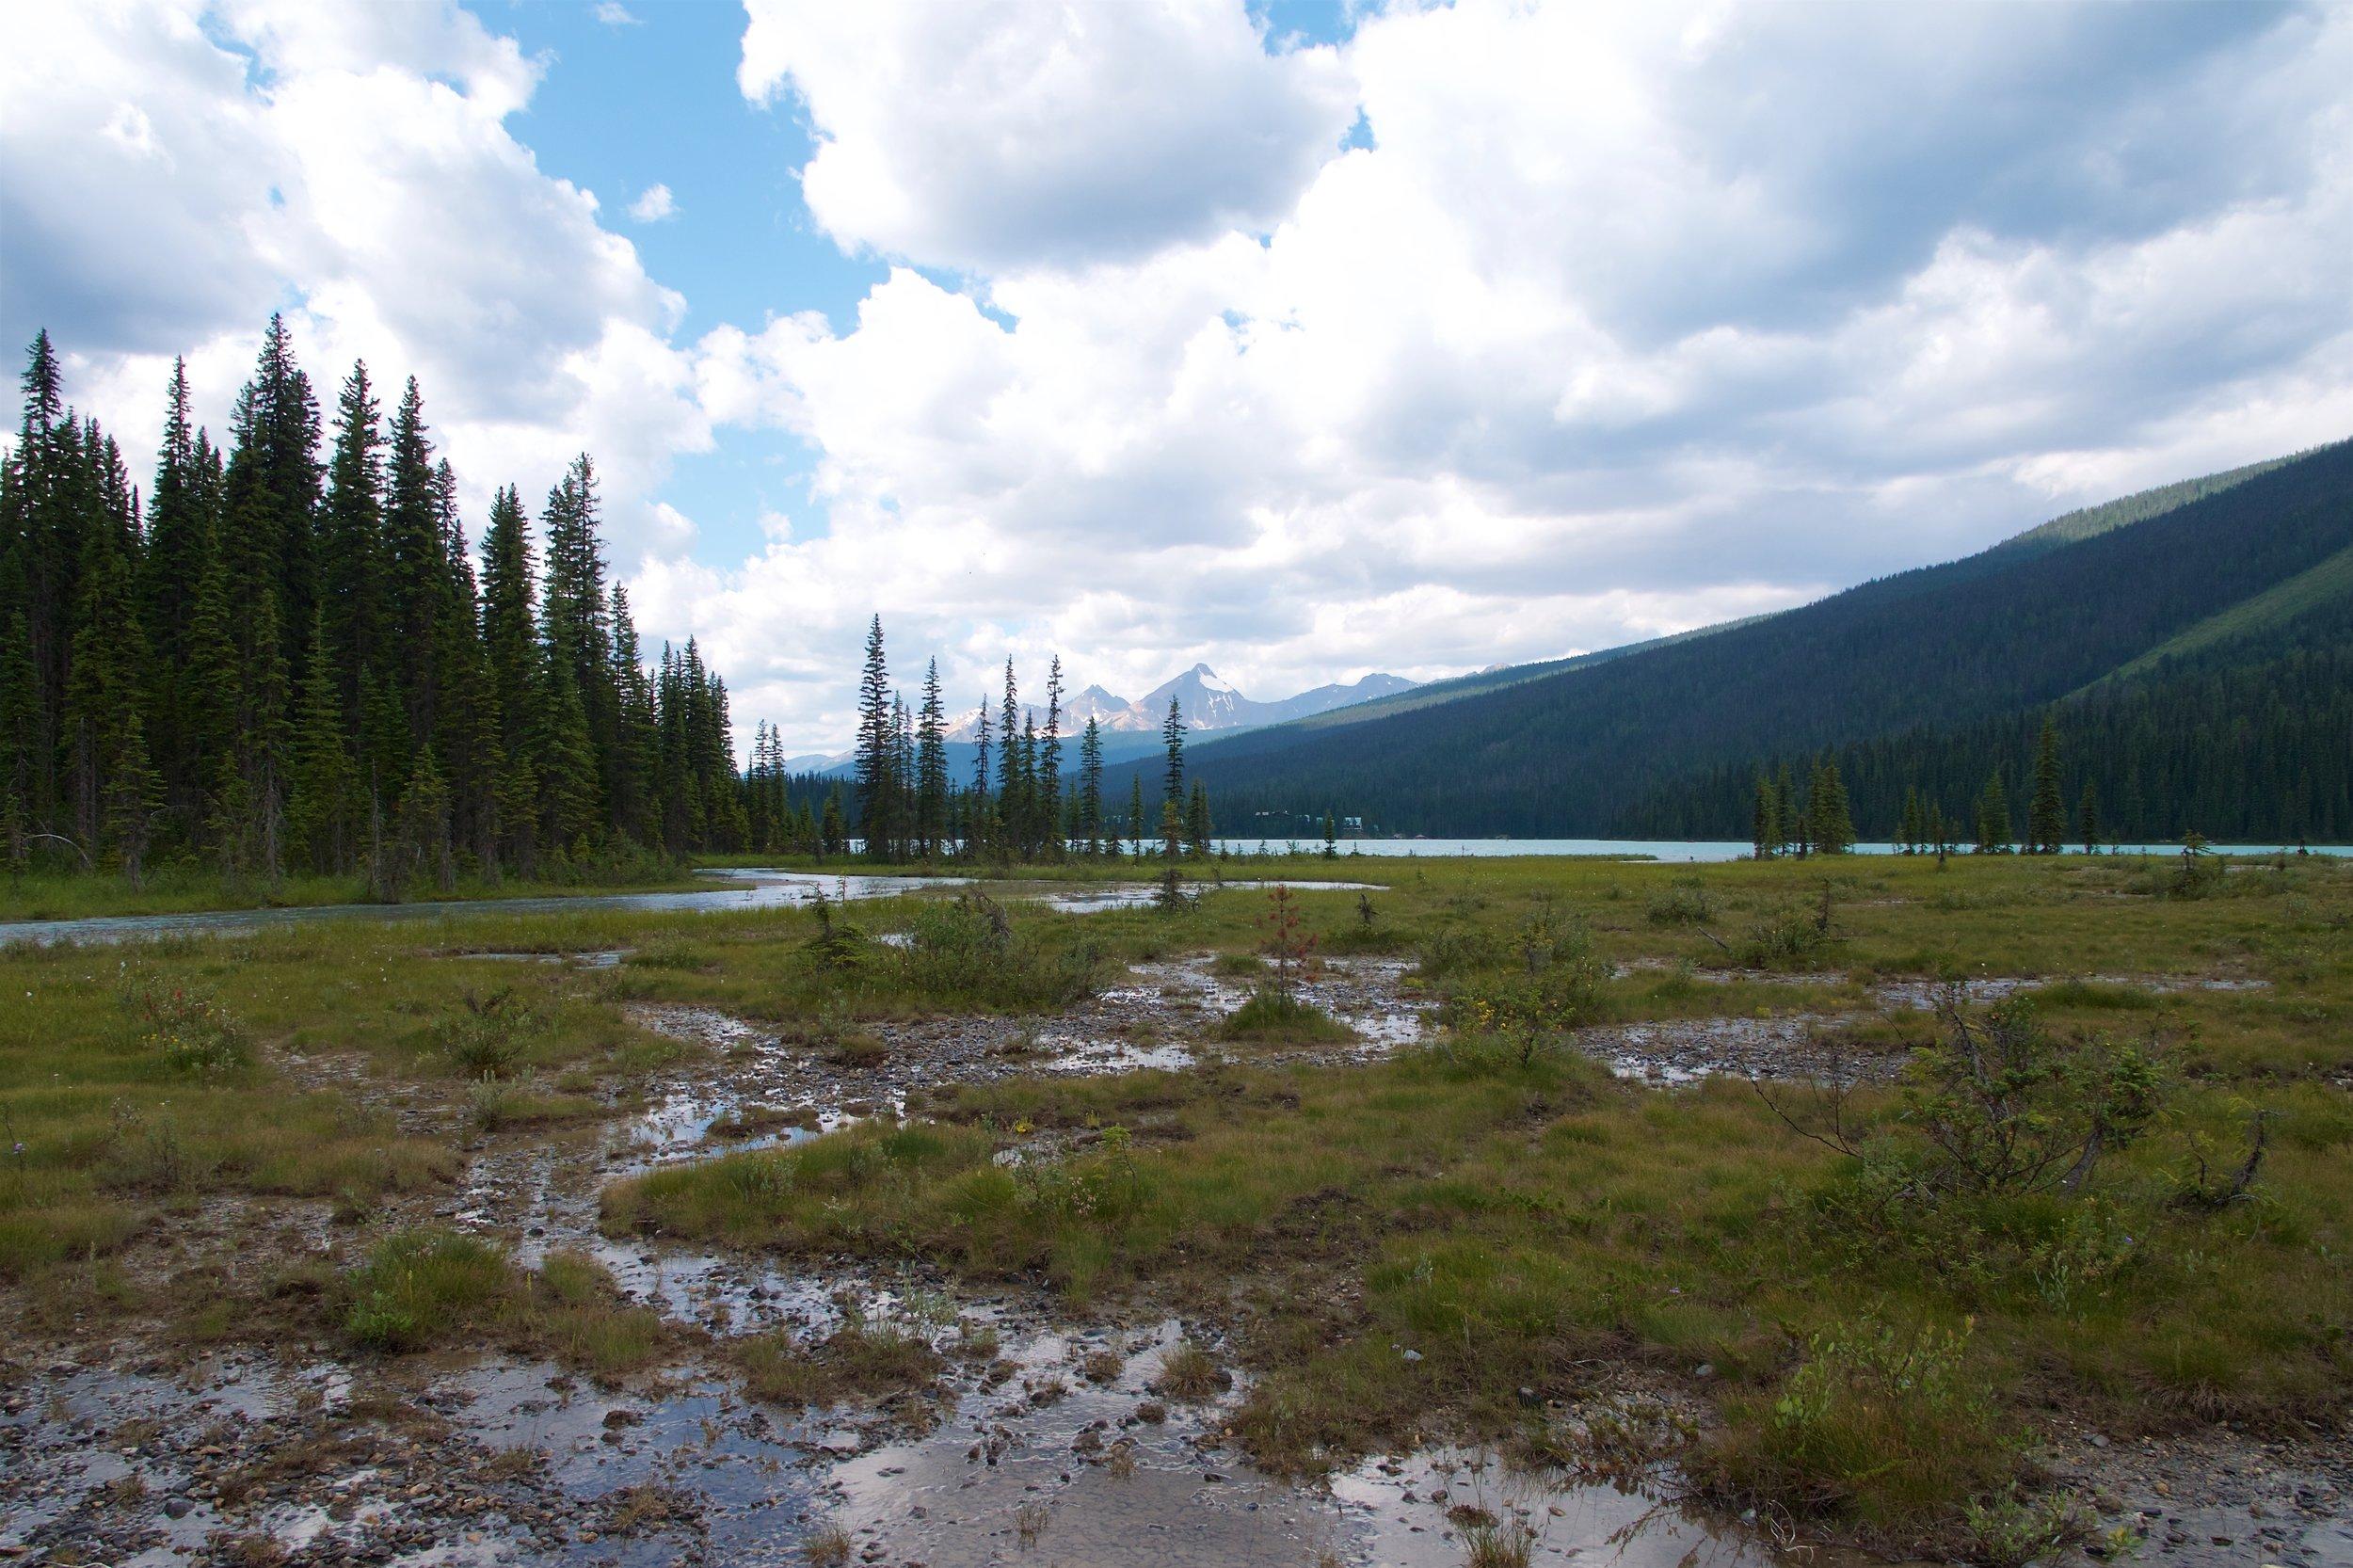 Delta end of Emerald Lake